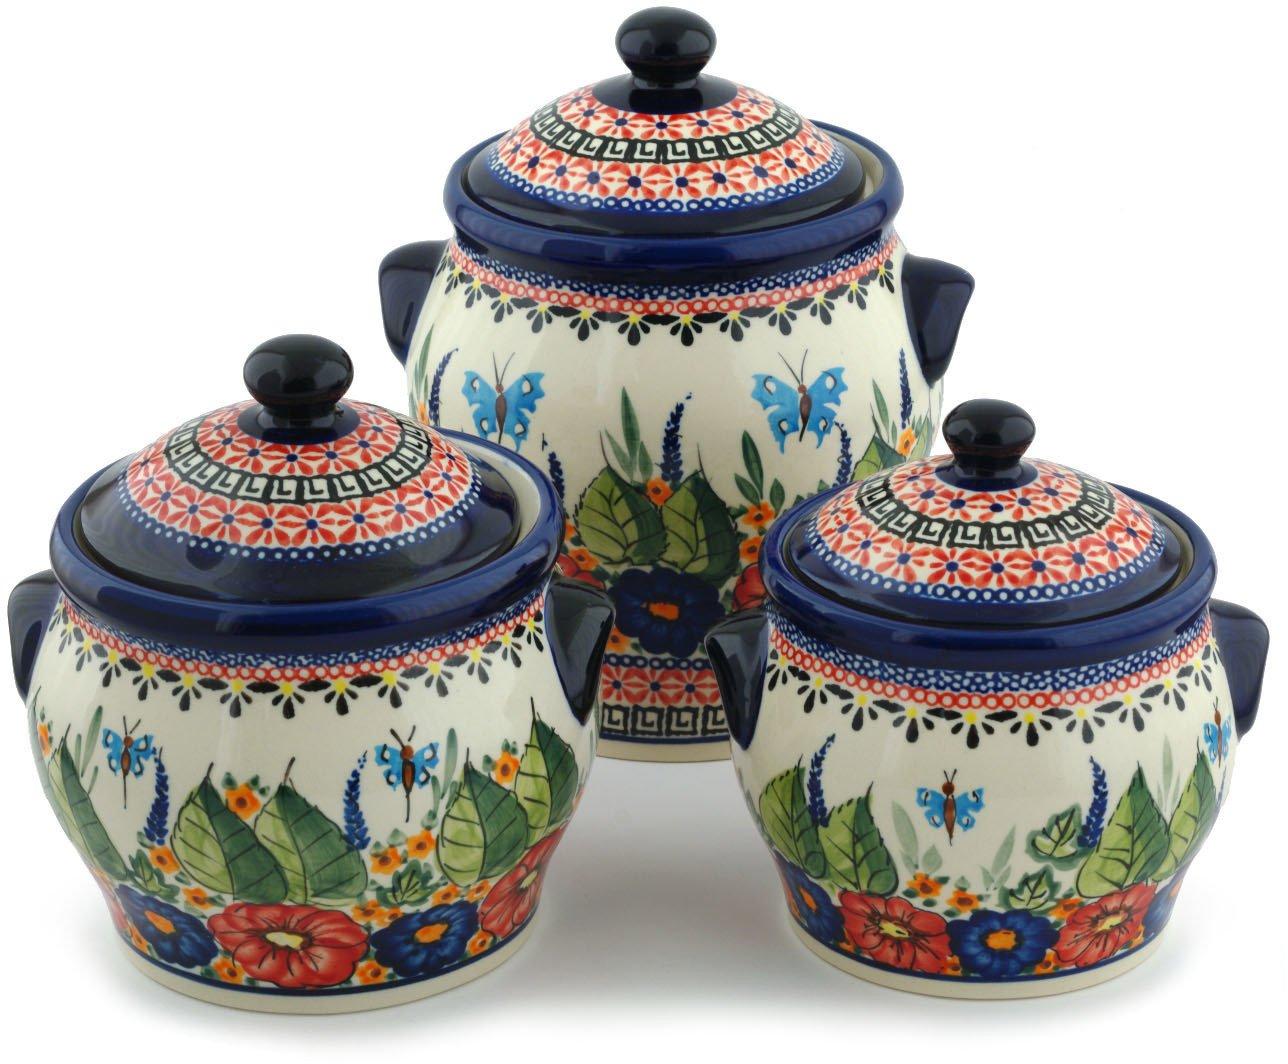 Polish Pottery Set of 3 Jars 8-inch Spring Splendor UNIKAT by Polmedia Polish Pottery